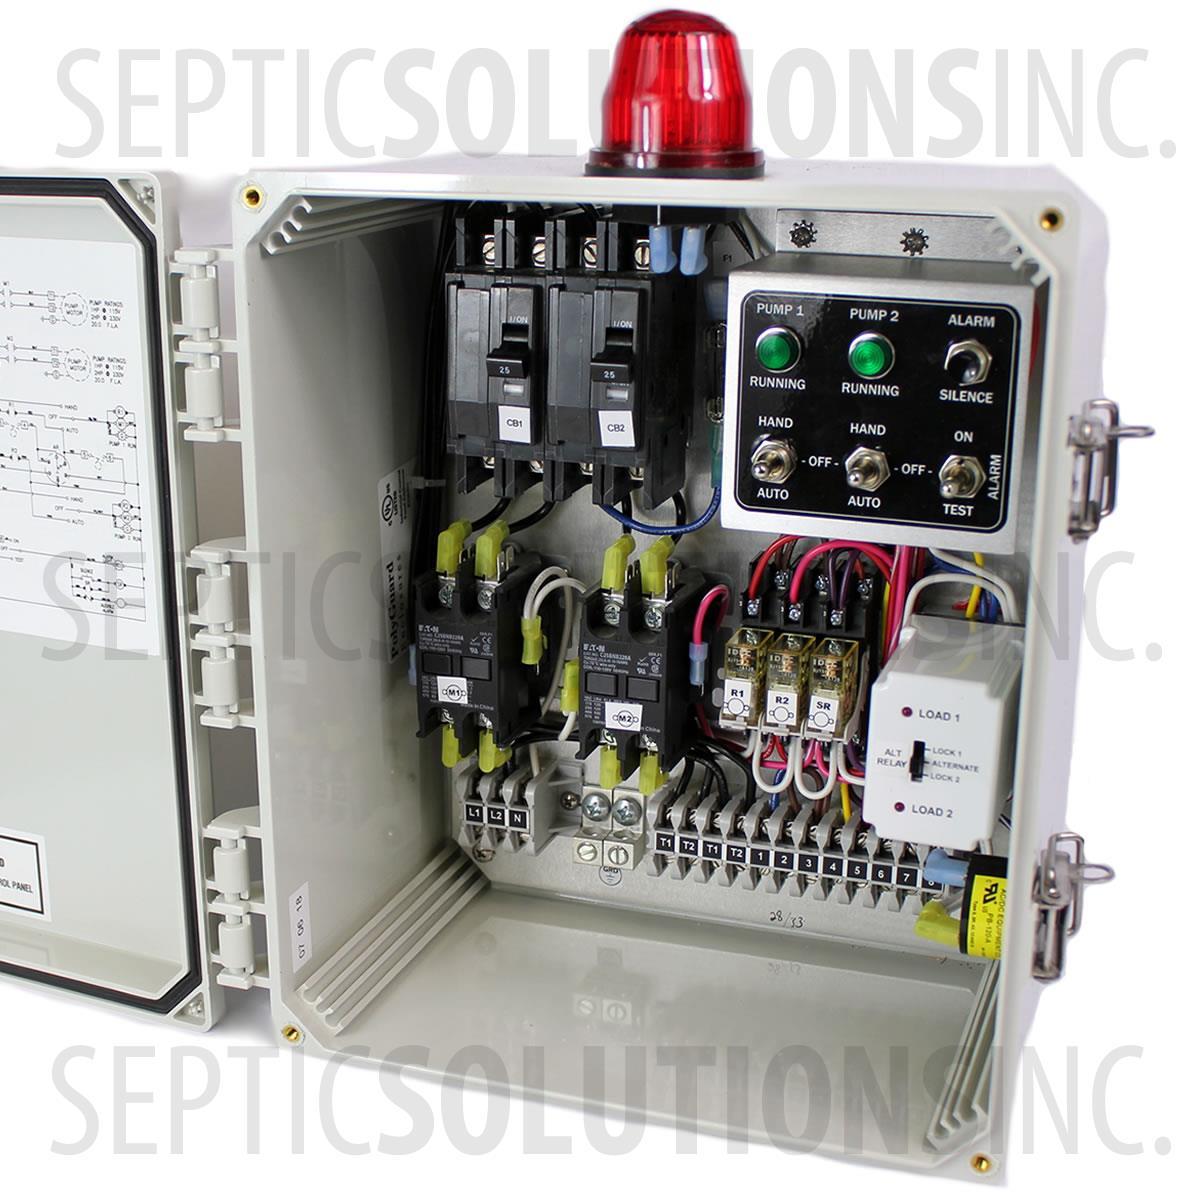 Spi Model Sdc12b Duplex Control Panel 50a506 Free Shipping